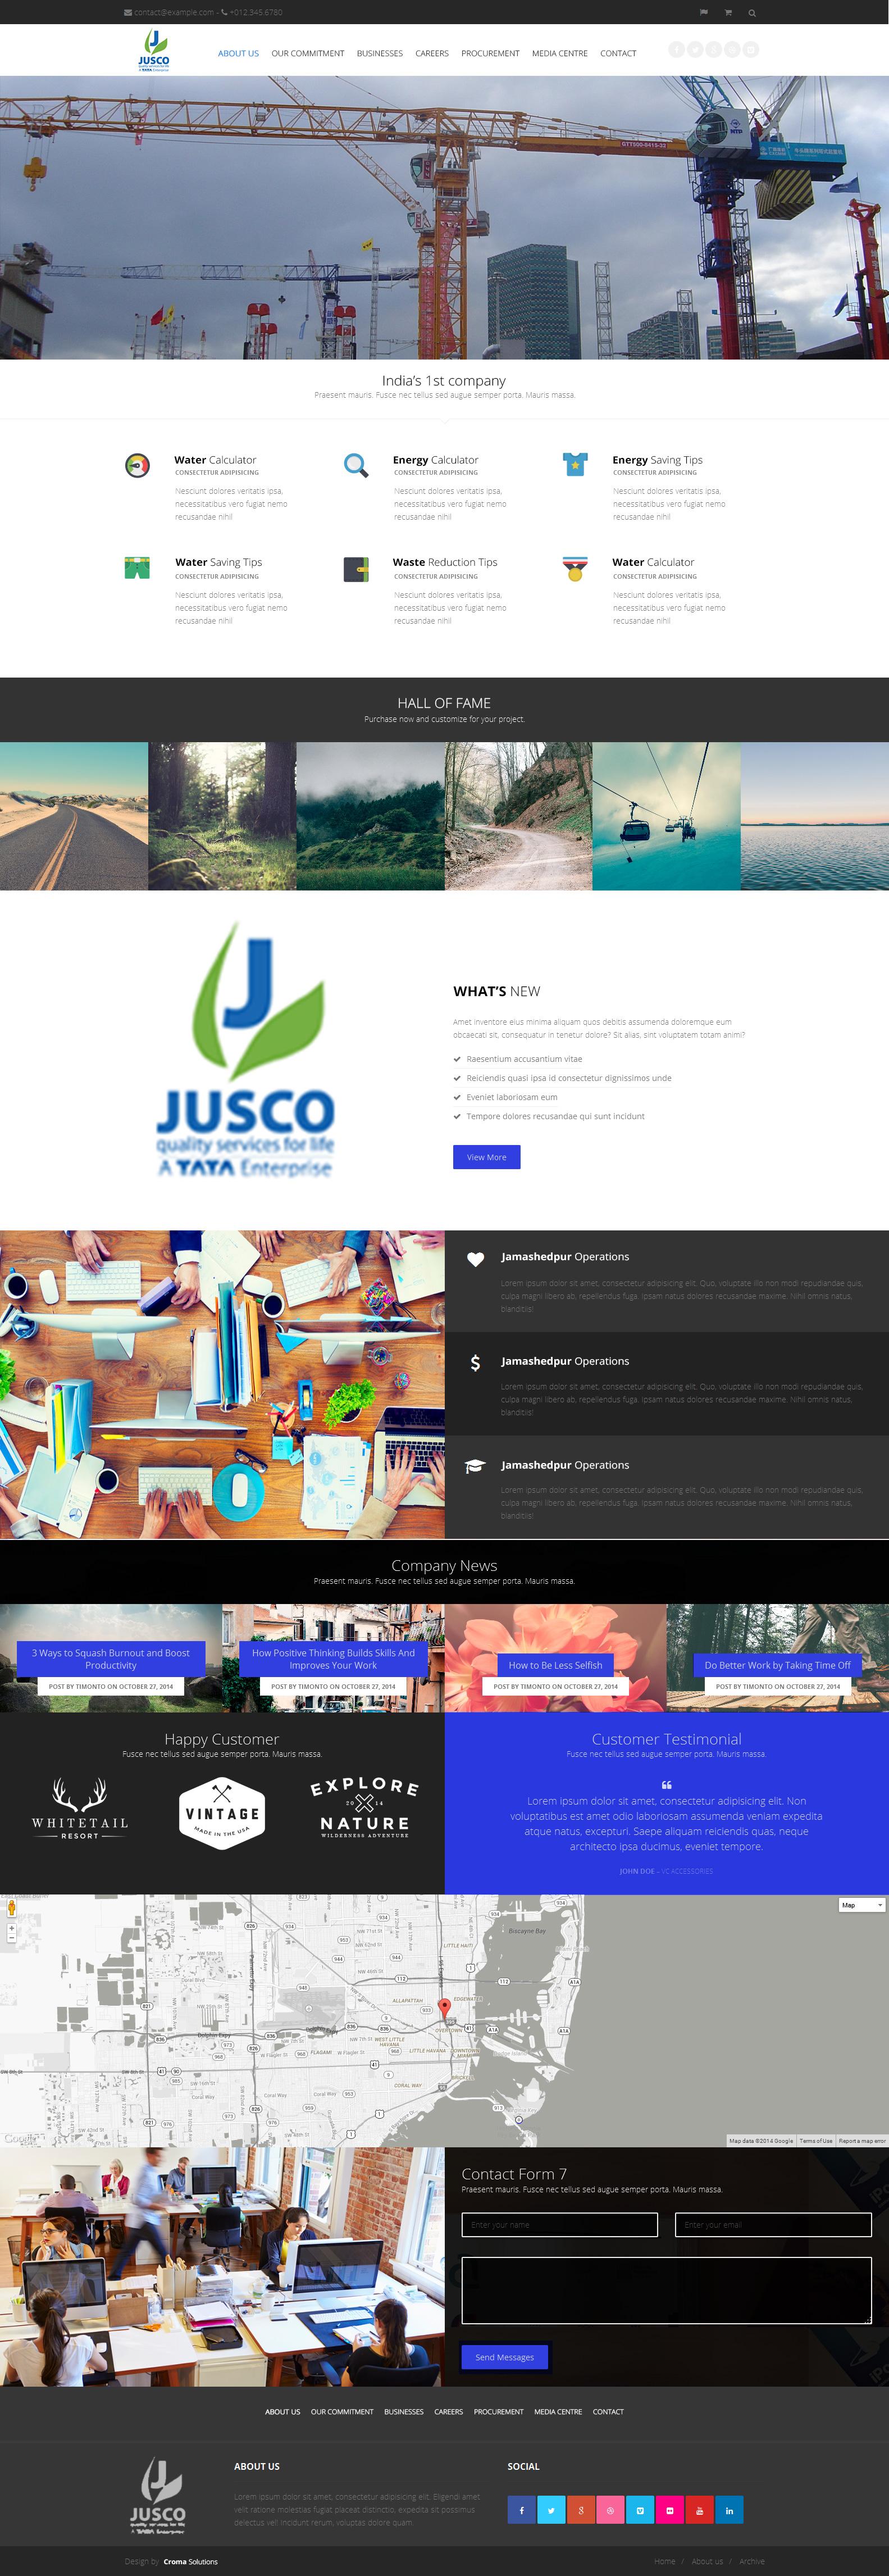 JUSCO 1